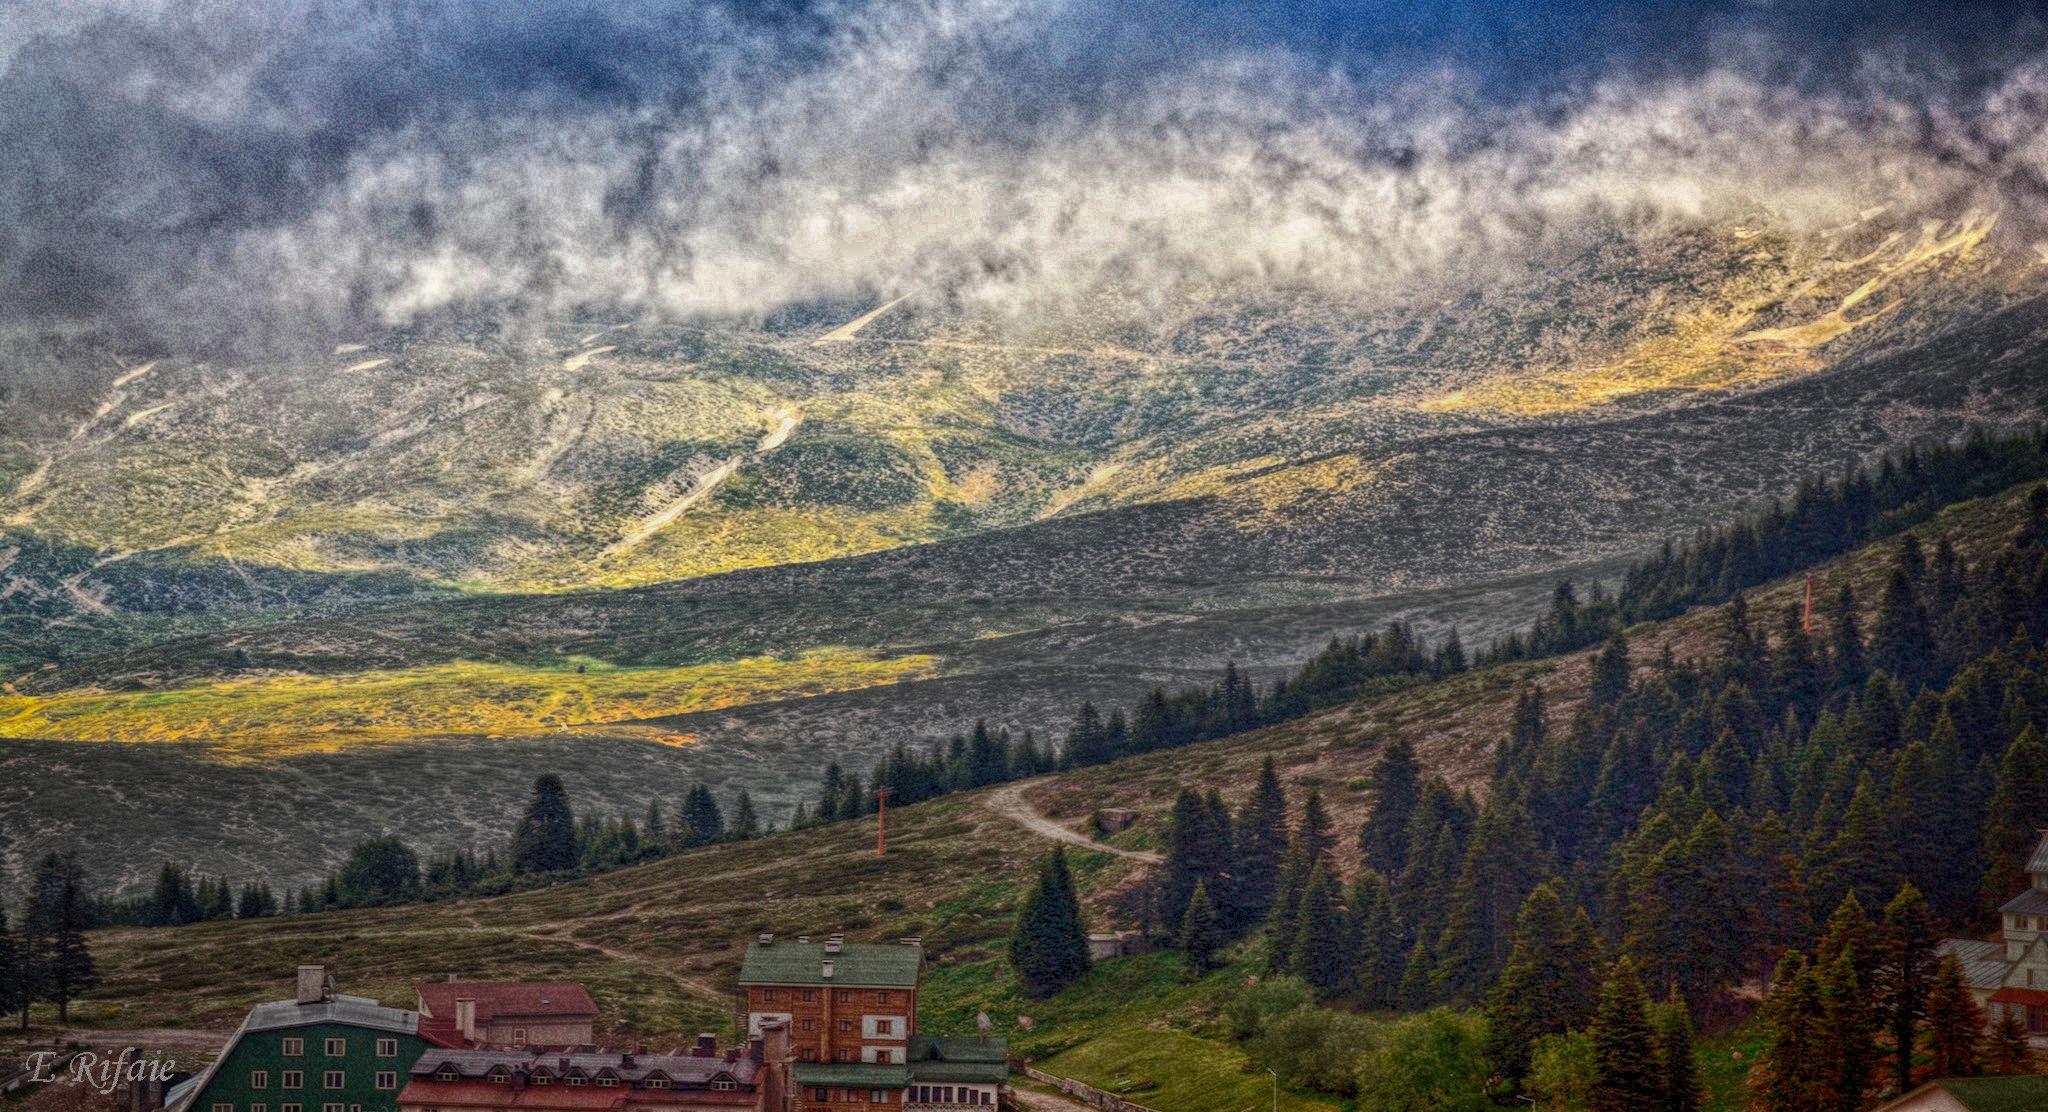 Turkish Mountains by Emad Eldin Moustafa El Refaie